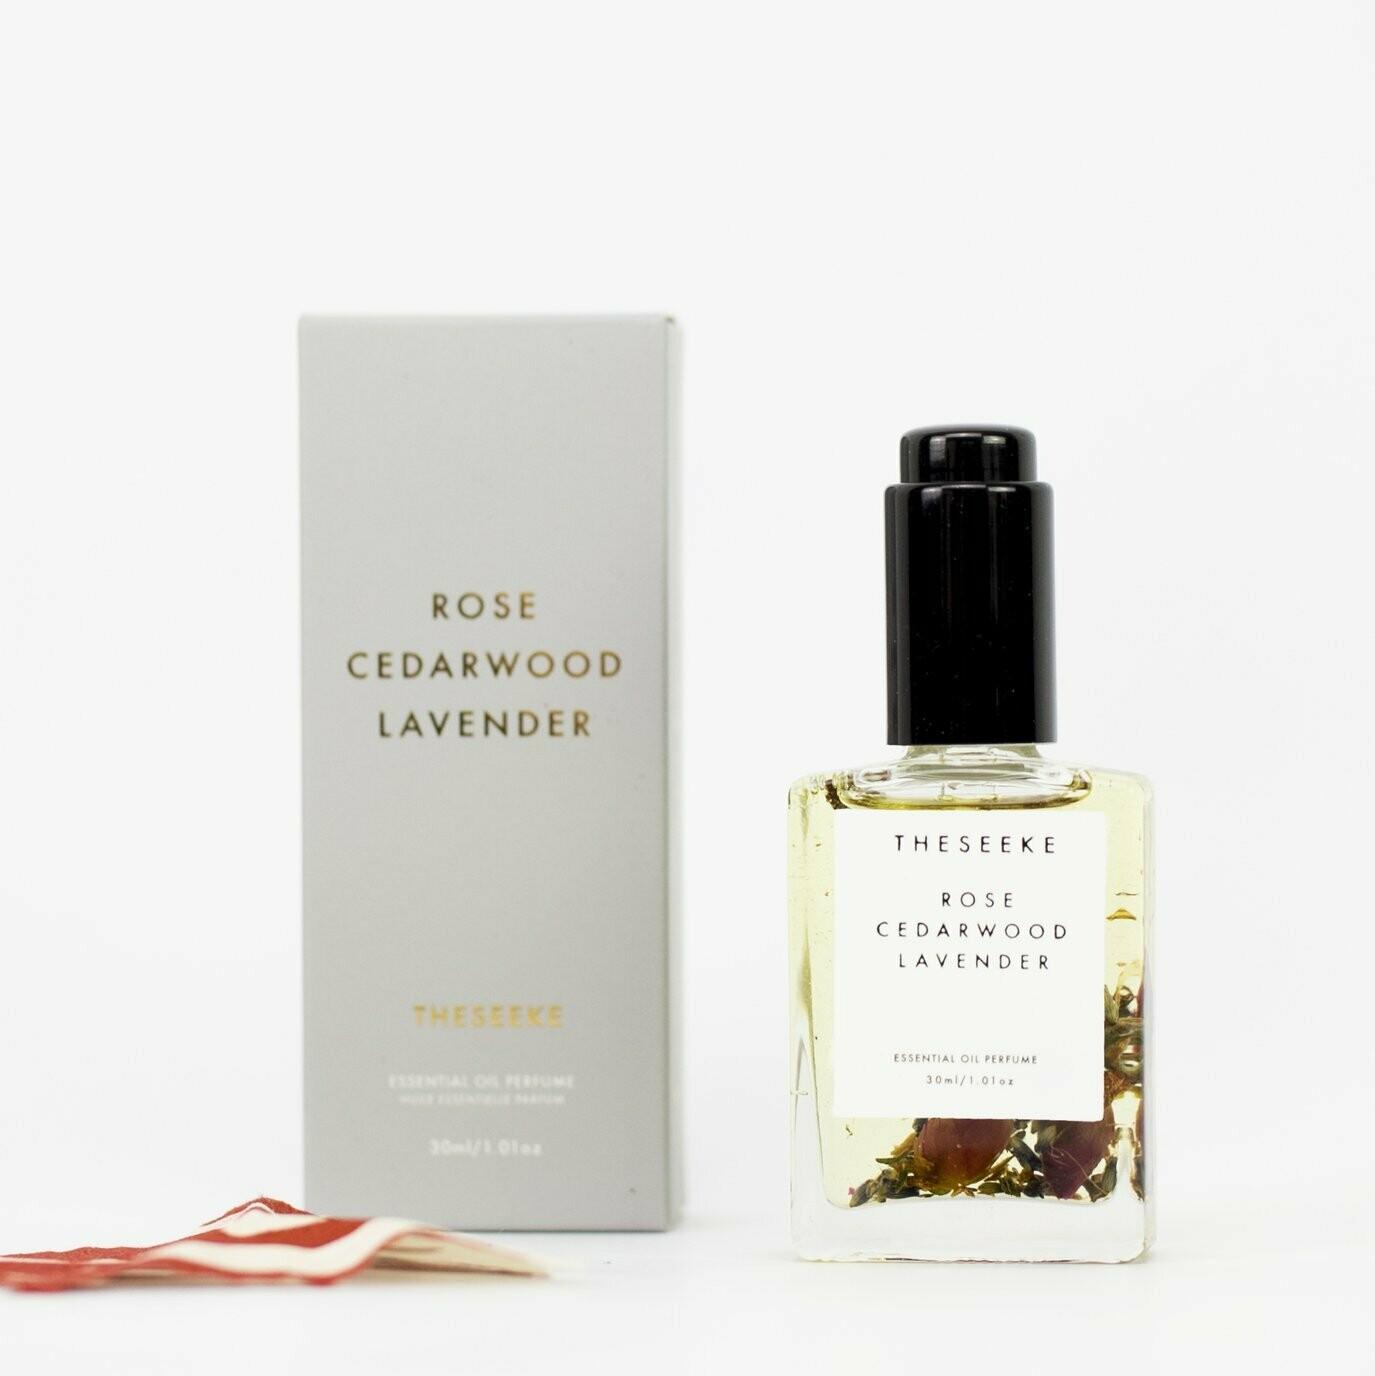 Theseeke - Rose, Cedarwood & Lavender